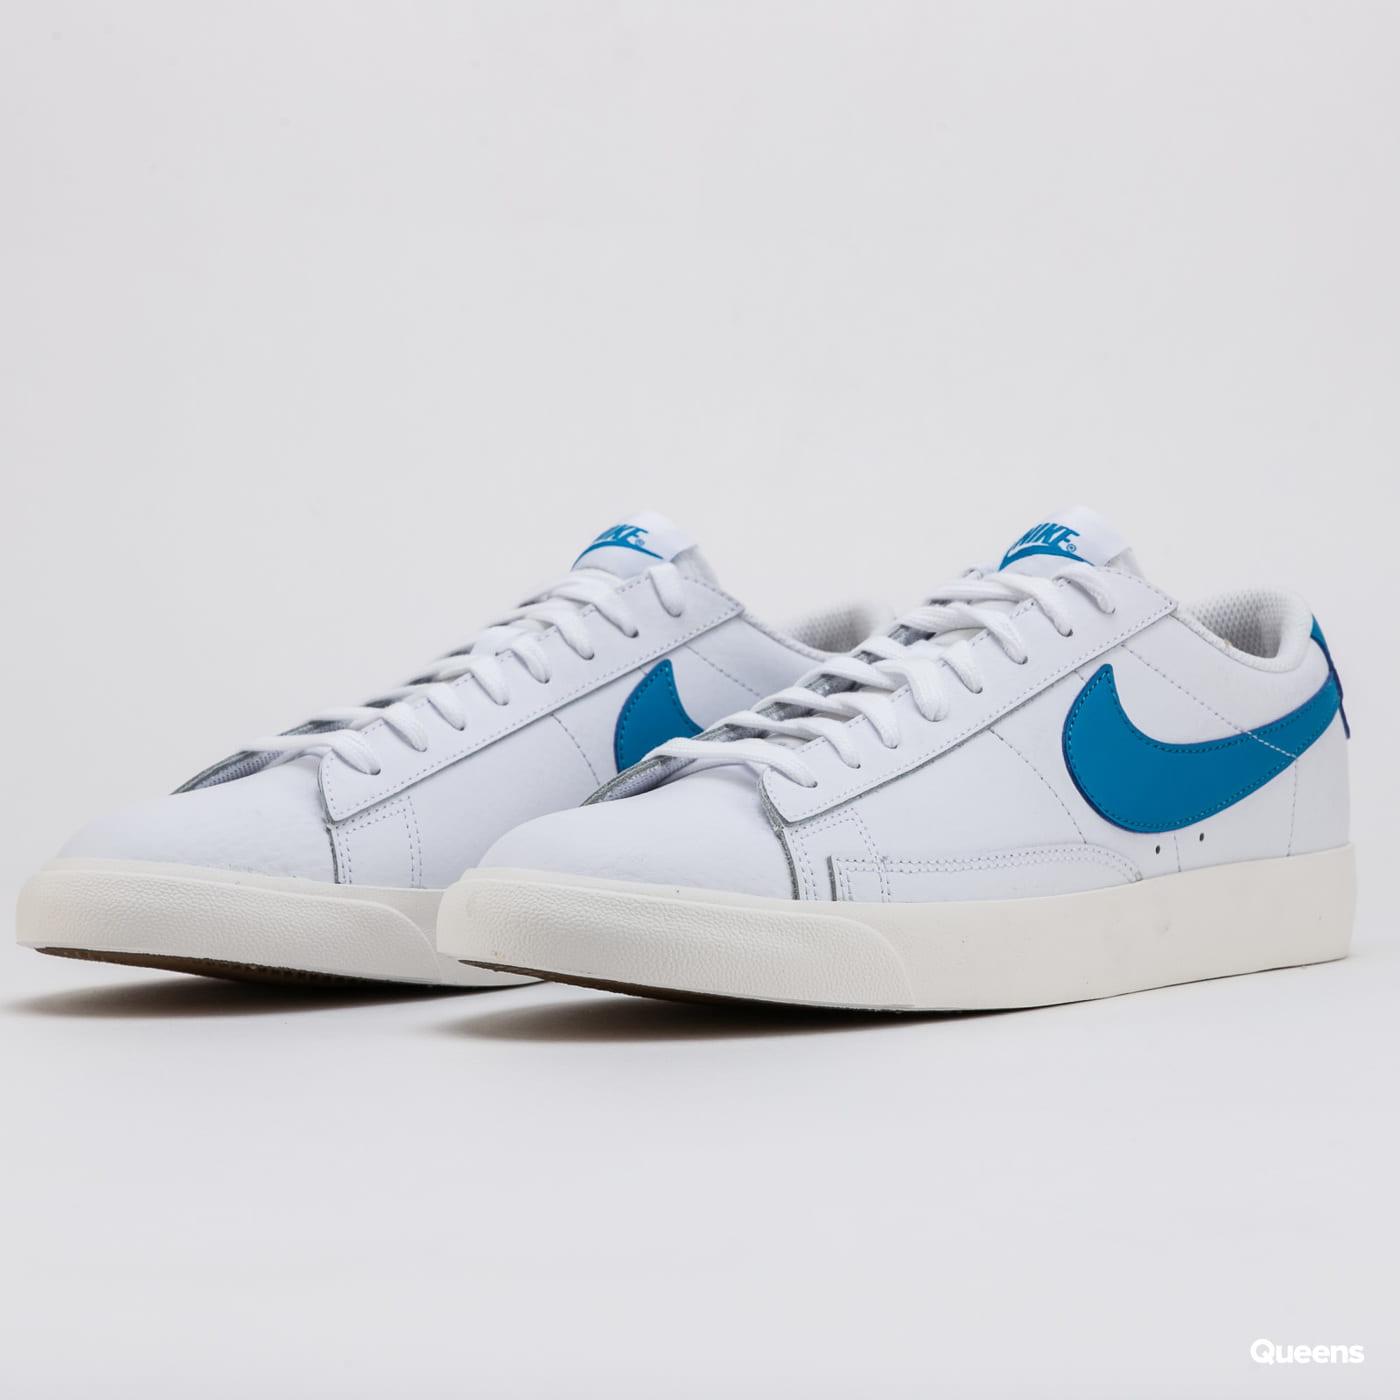 Nike Blazer Low Leather white / laser blue - sail